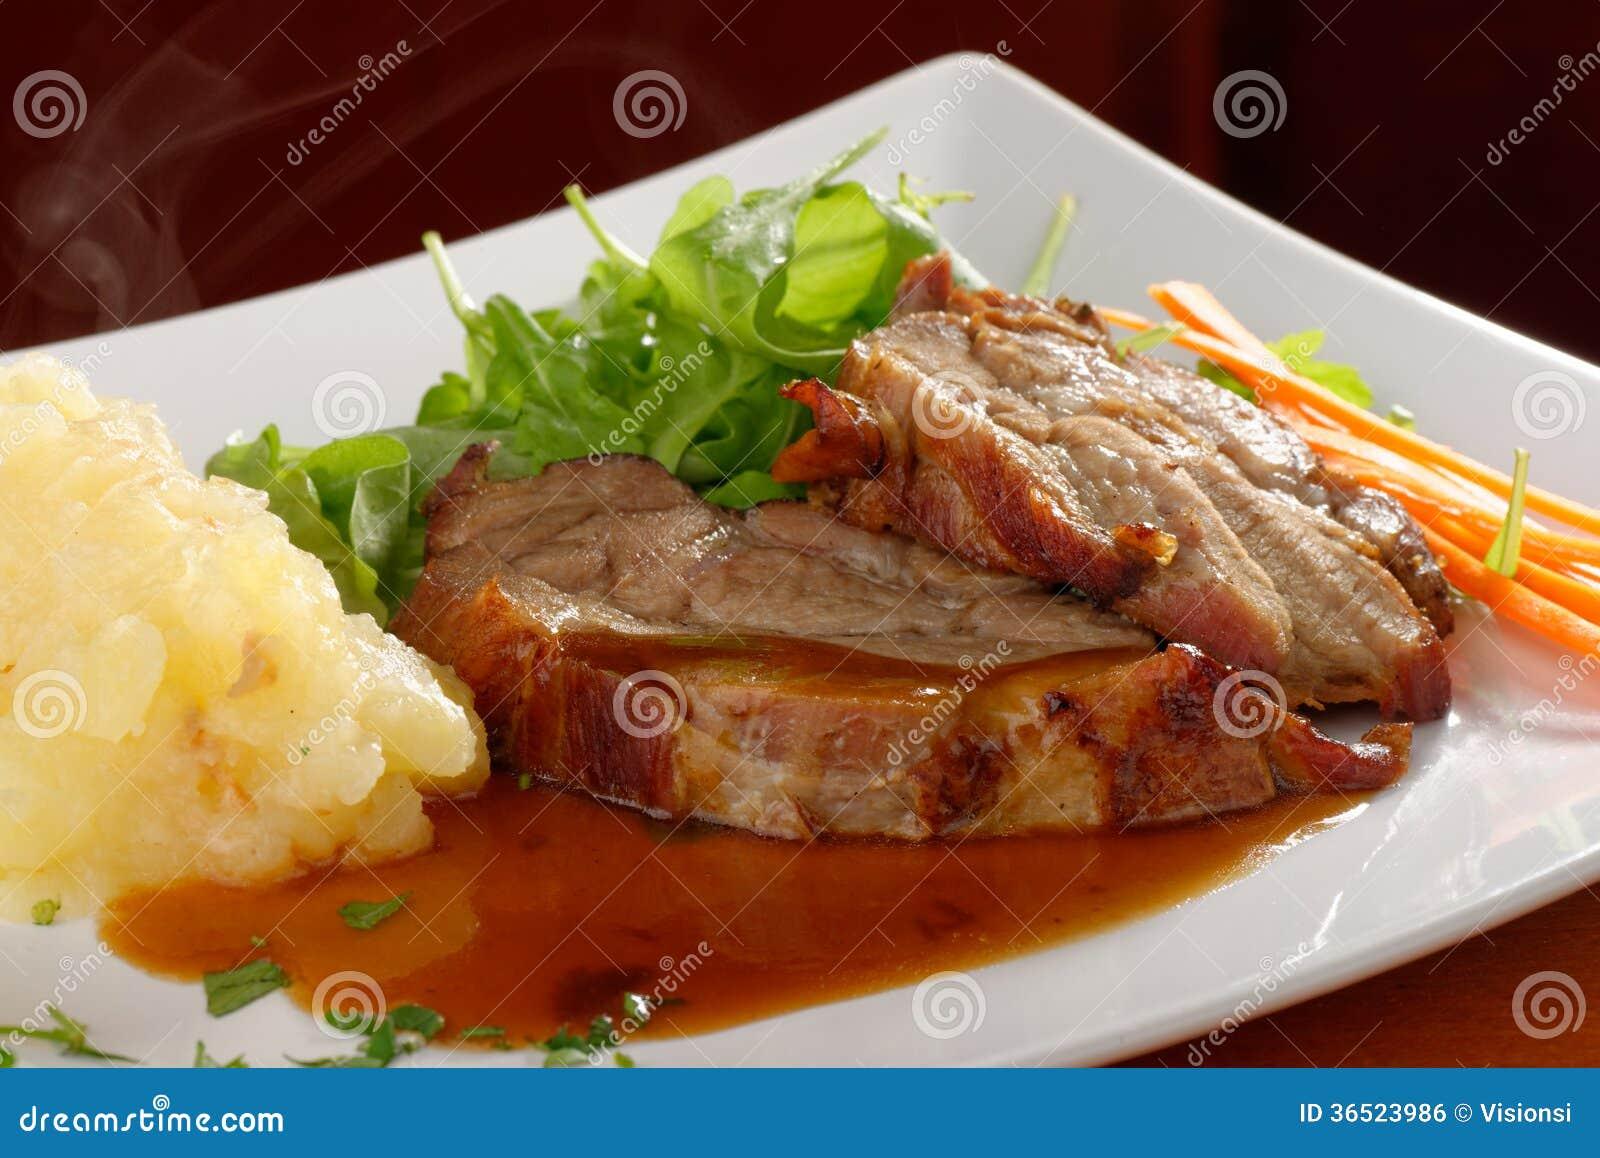 Chuleta de cerdo frita